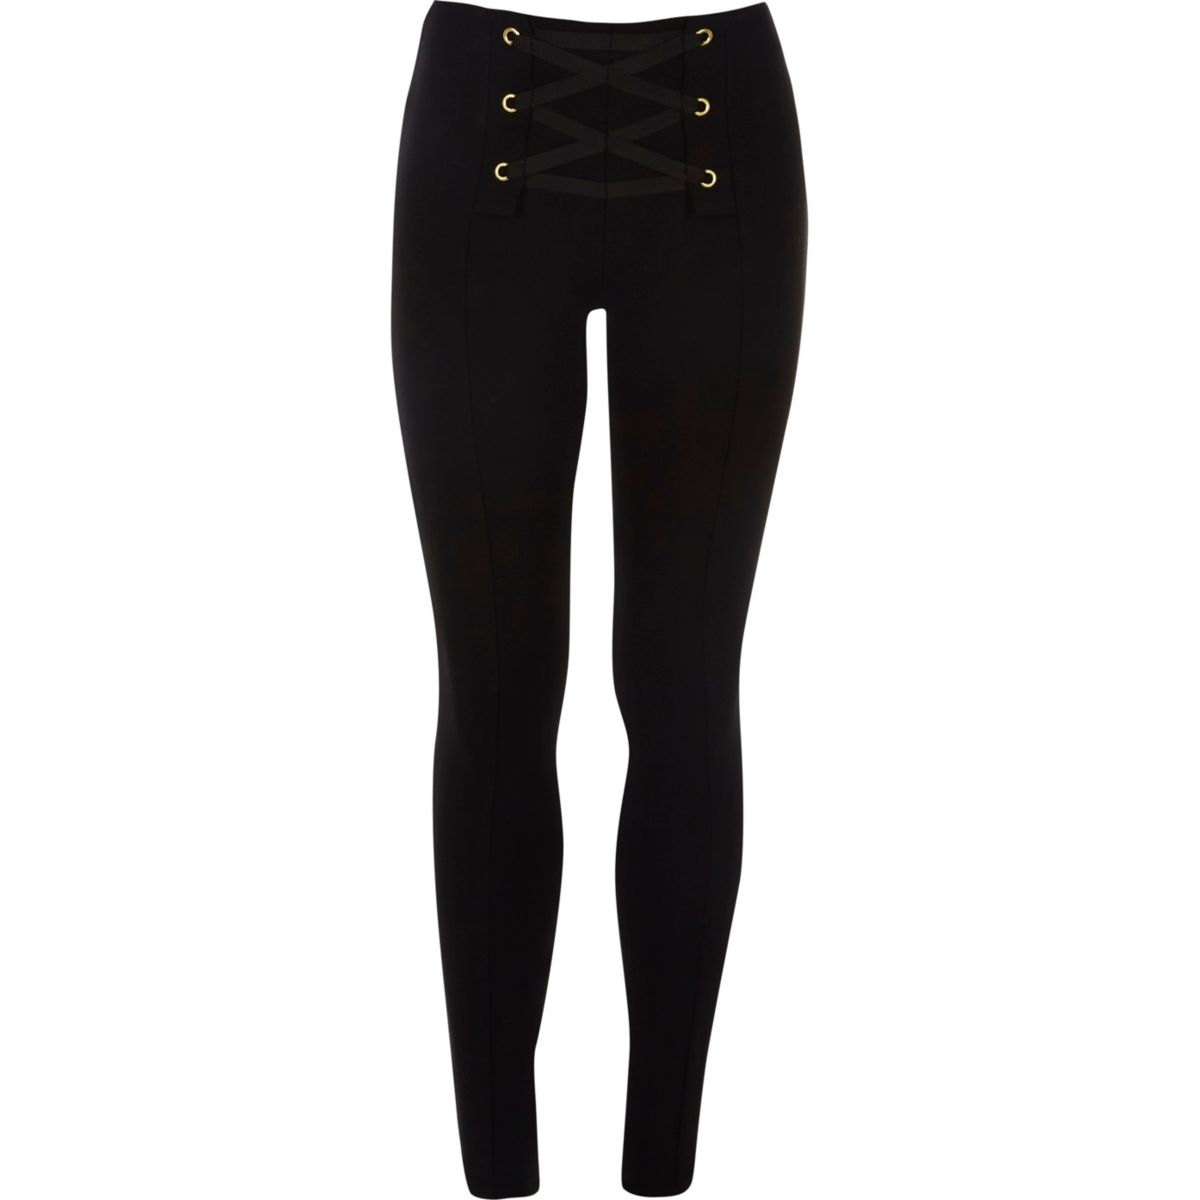 Girls black lace-up front leggings